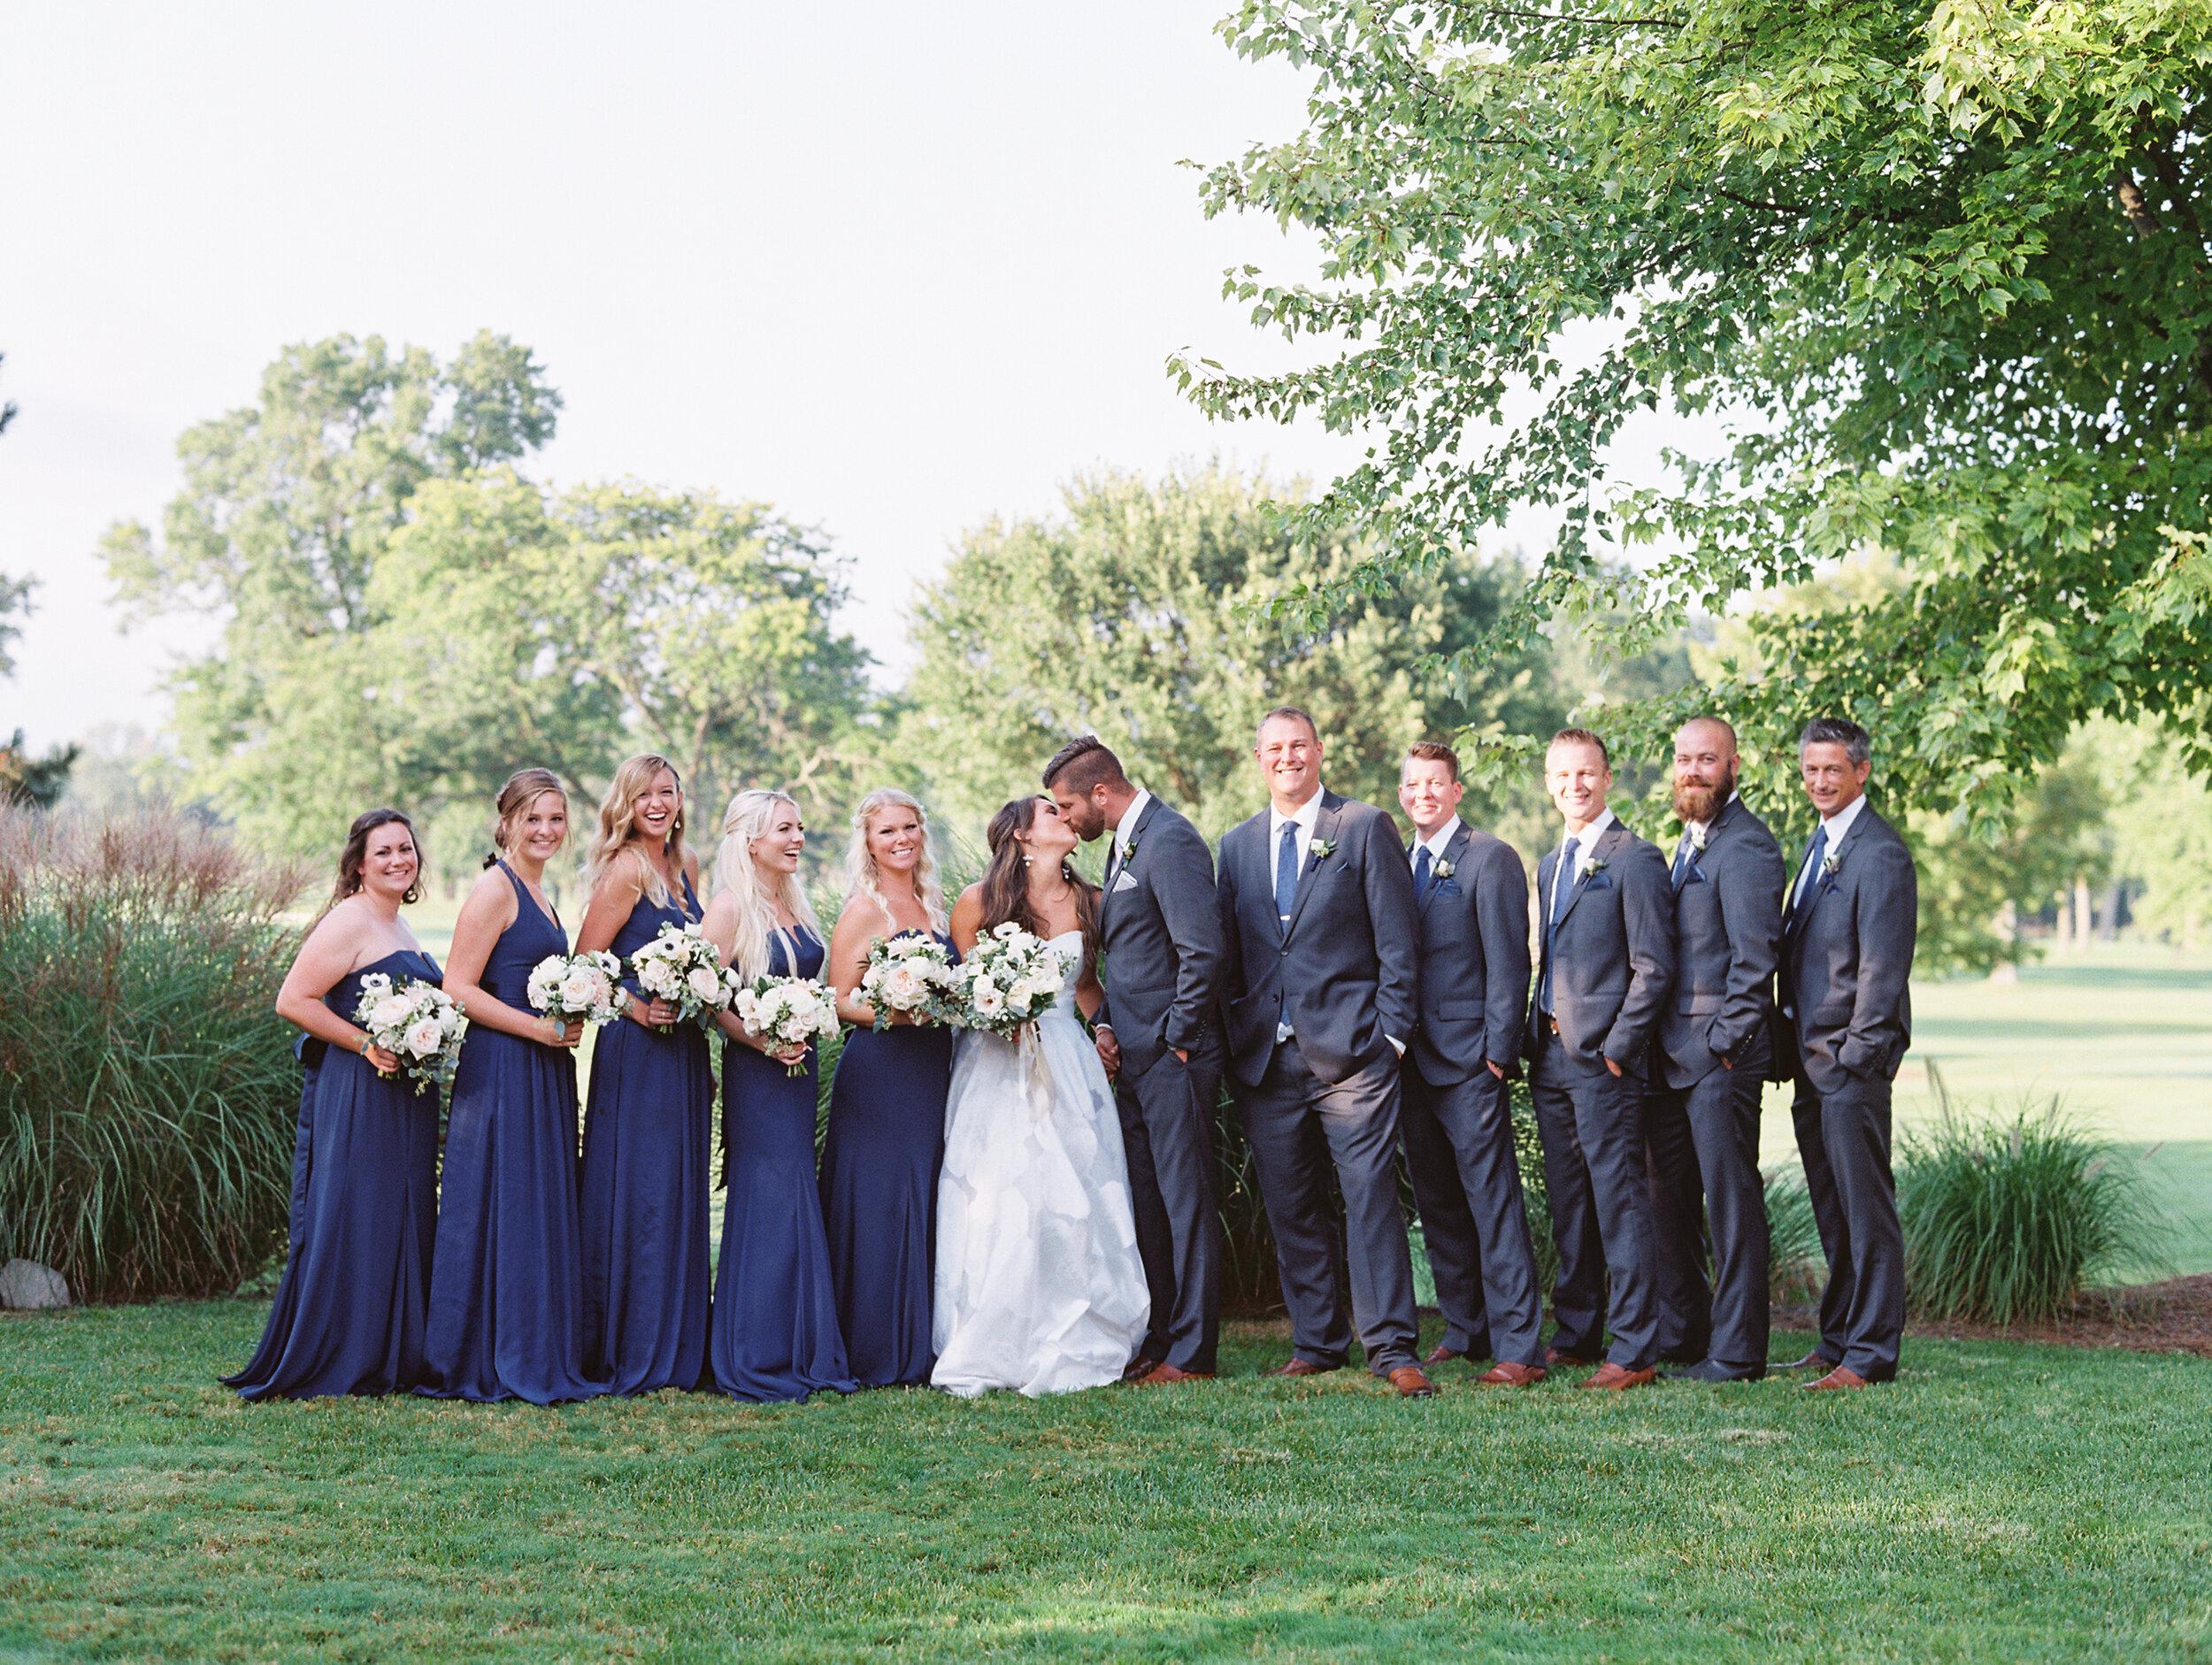 Kuiper+Wedding+Reception+Bridal+Party-124.jpg